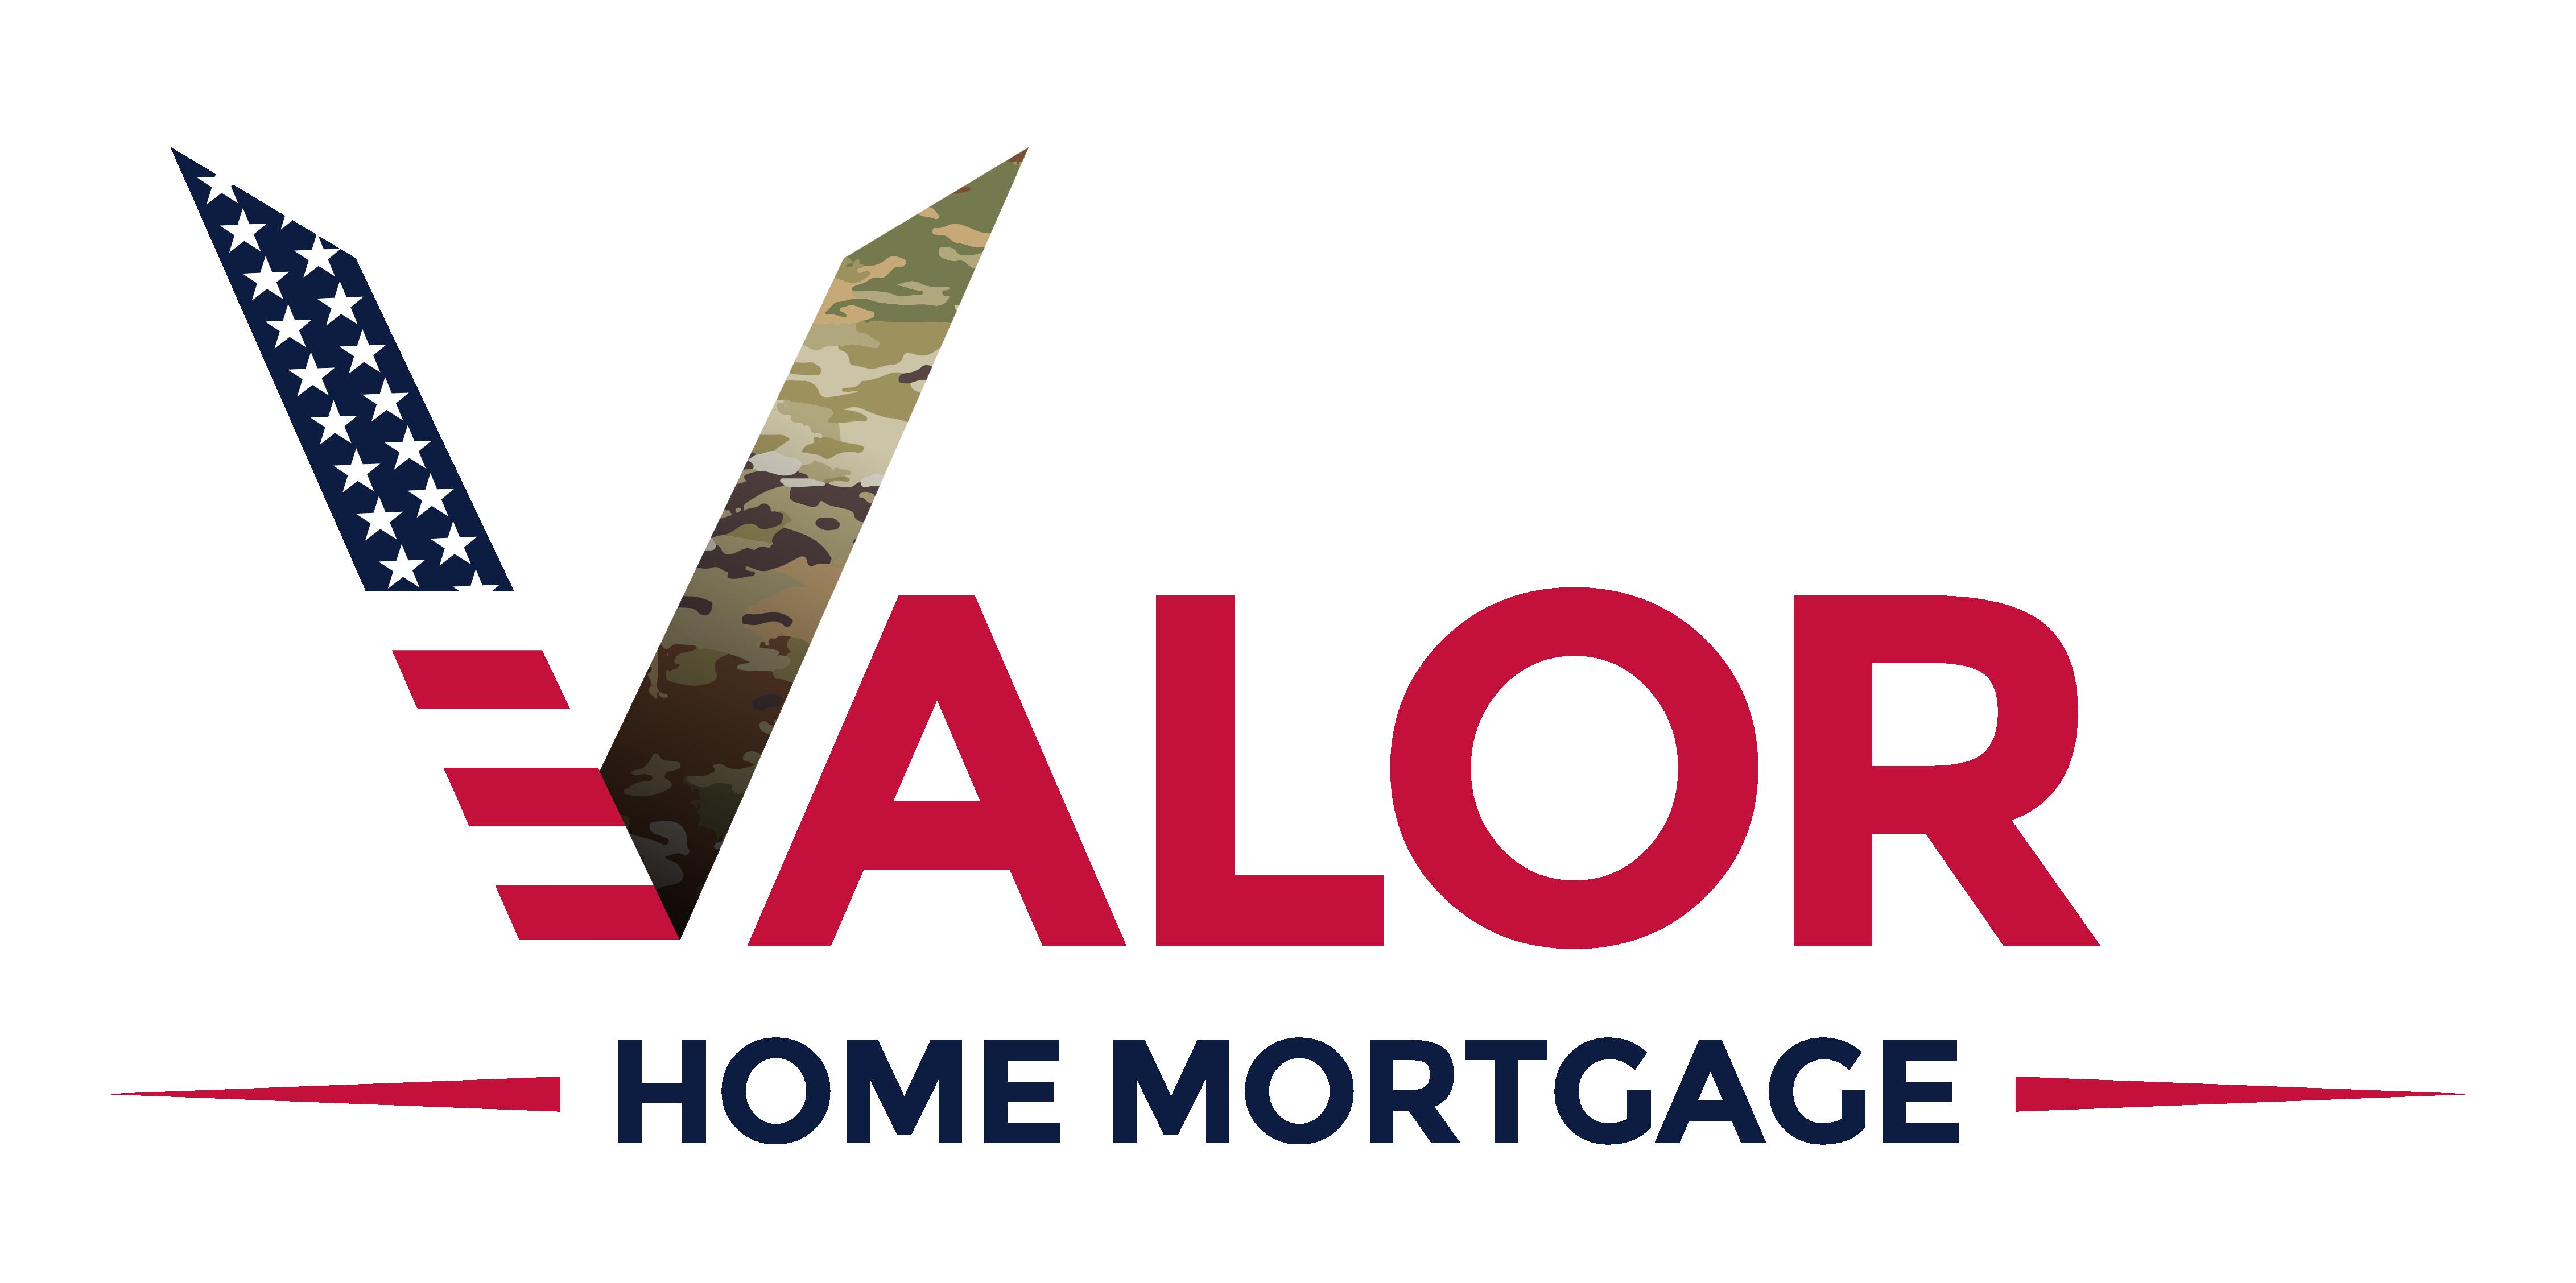 Valor Home Mortgage